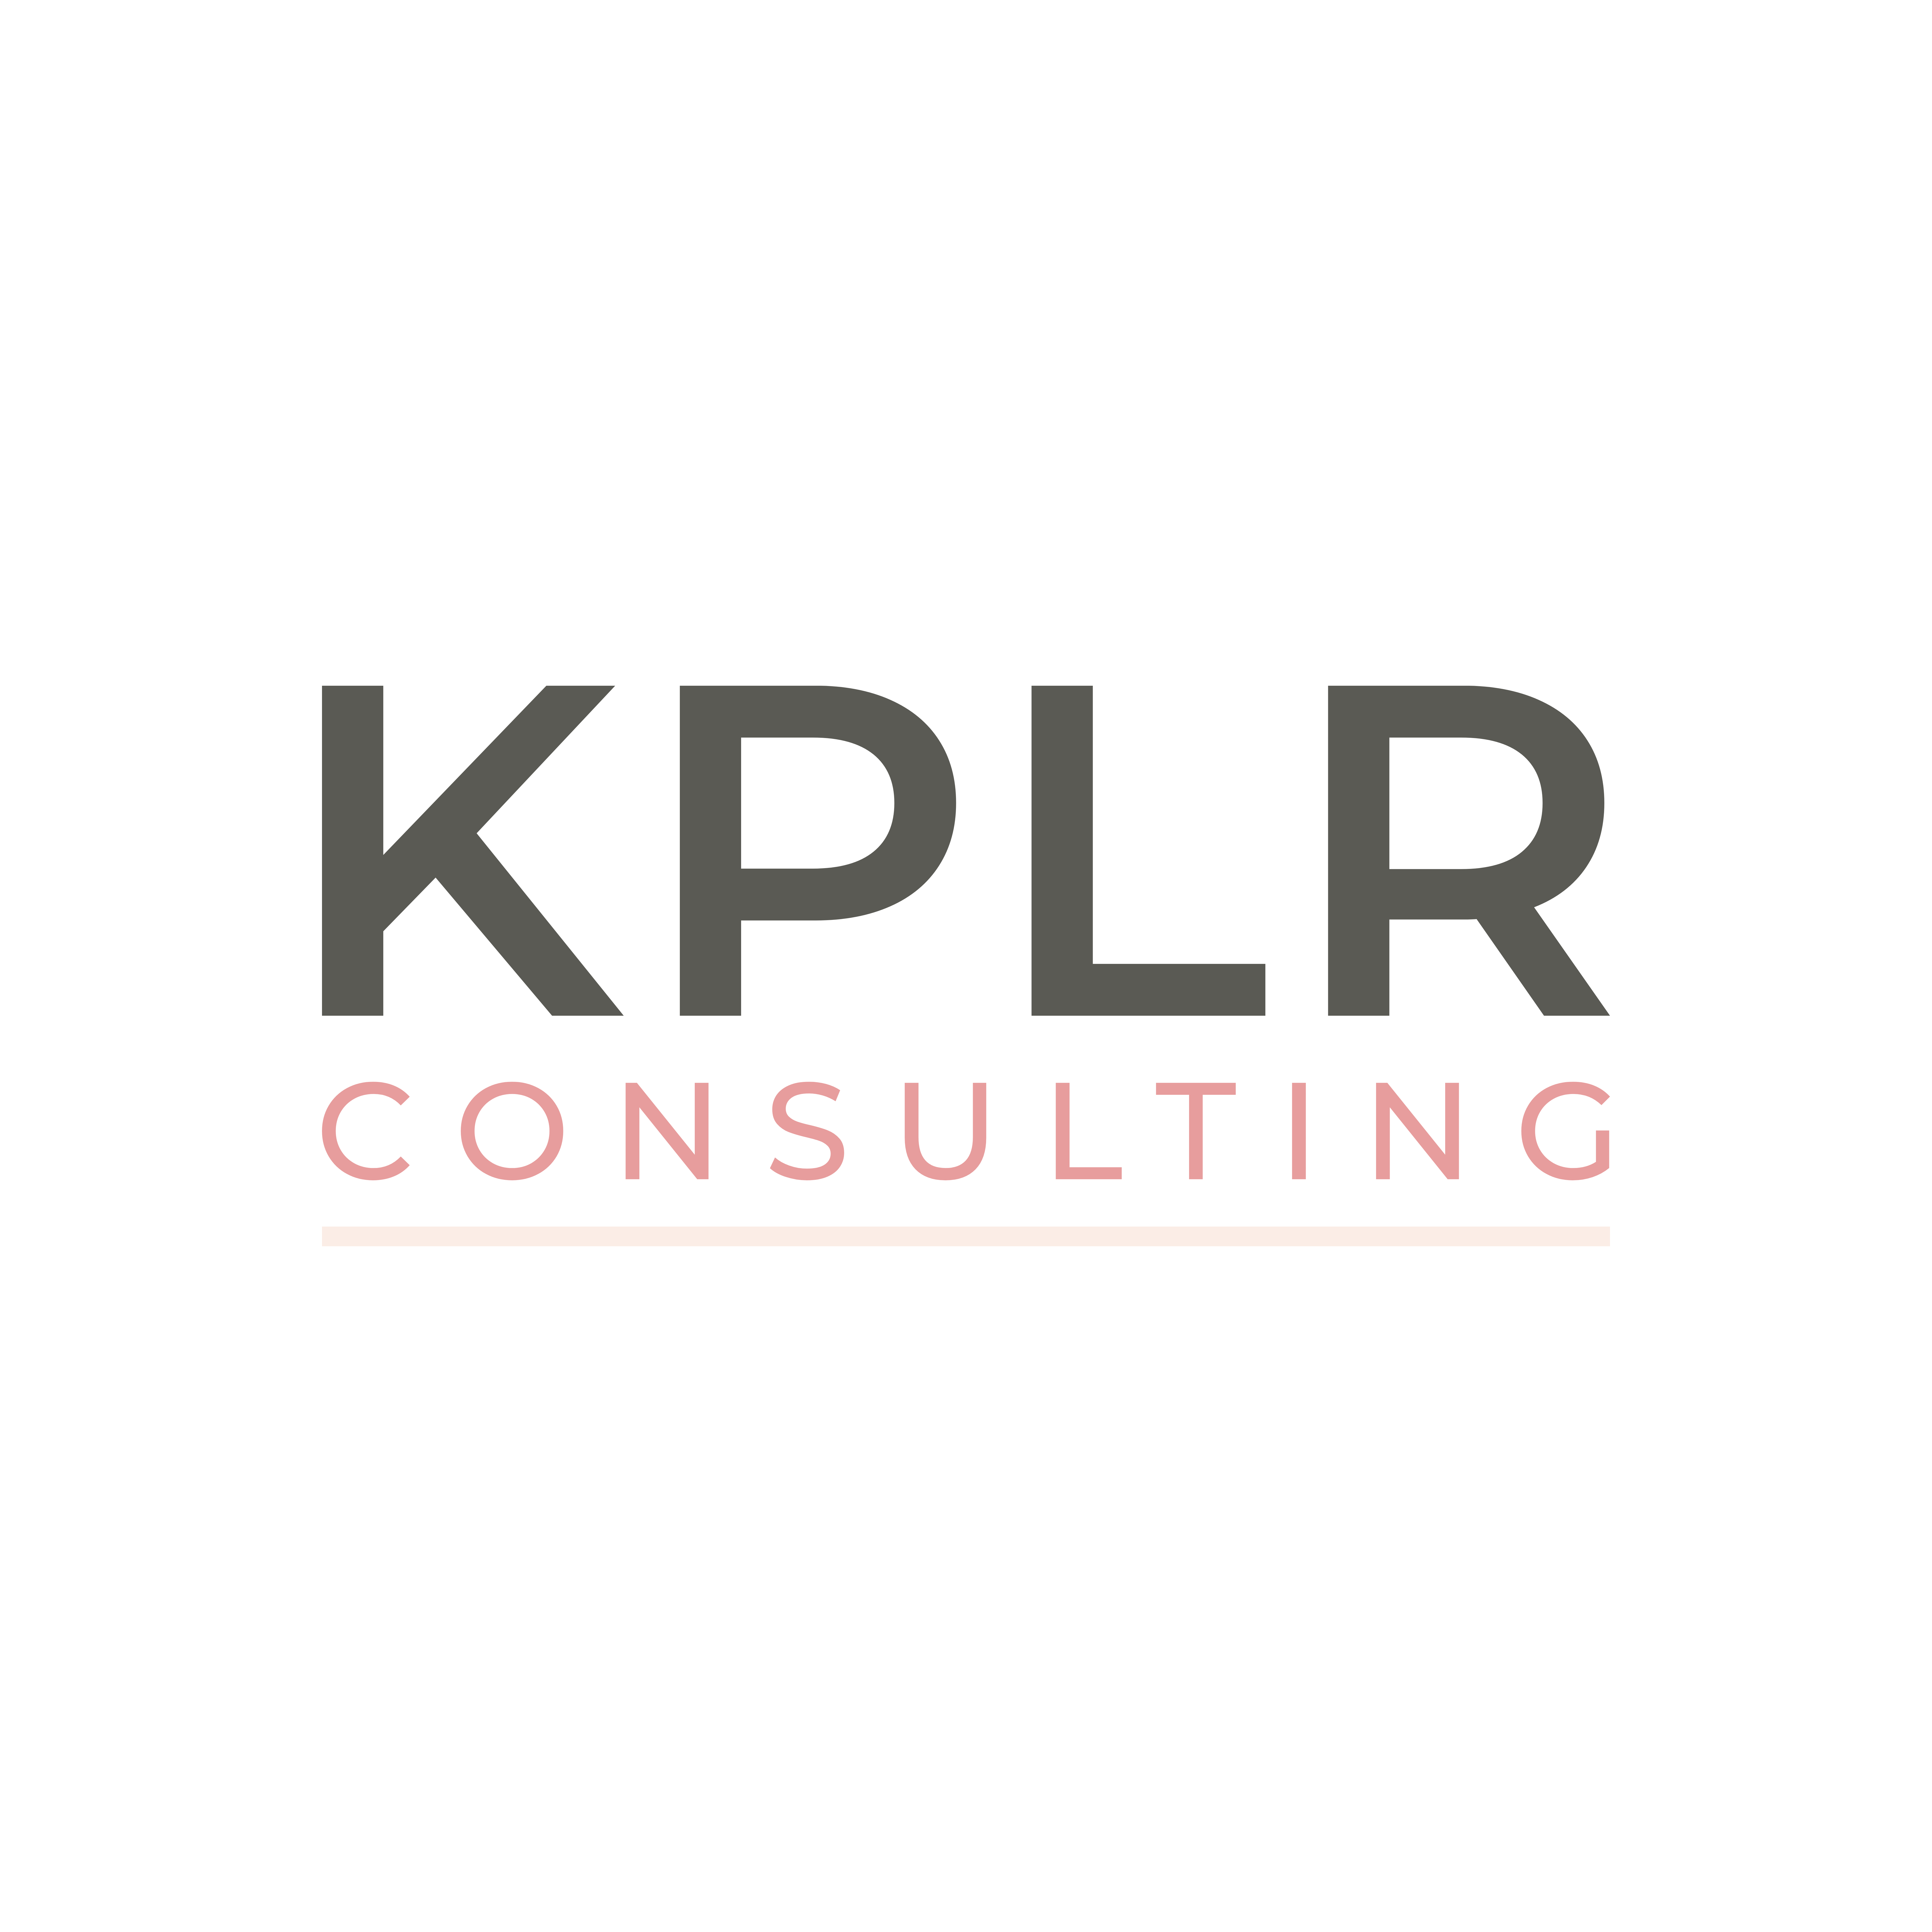 KPLR Consulting